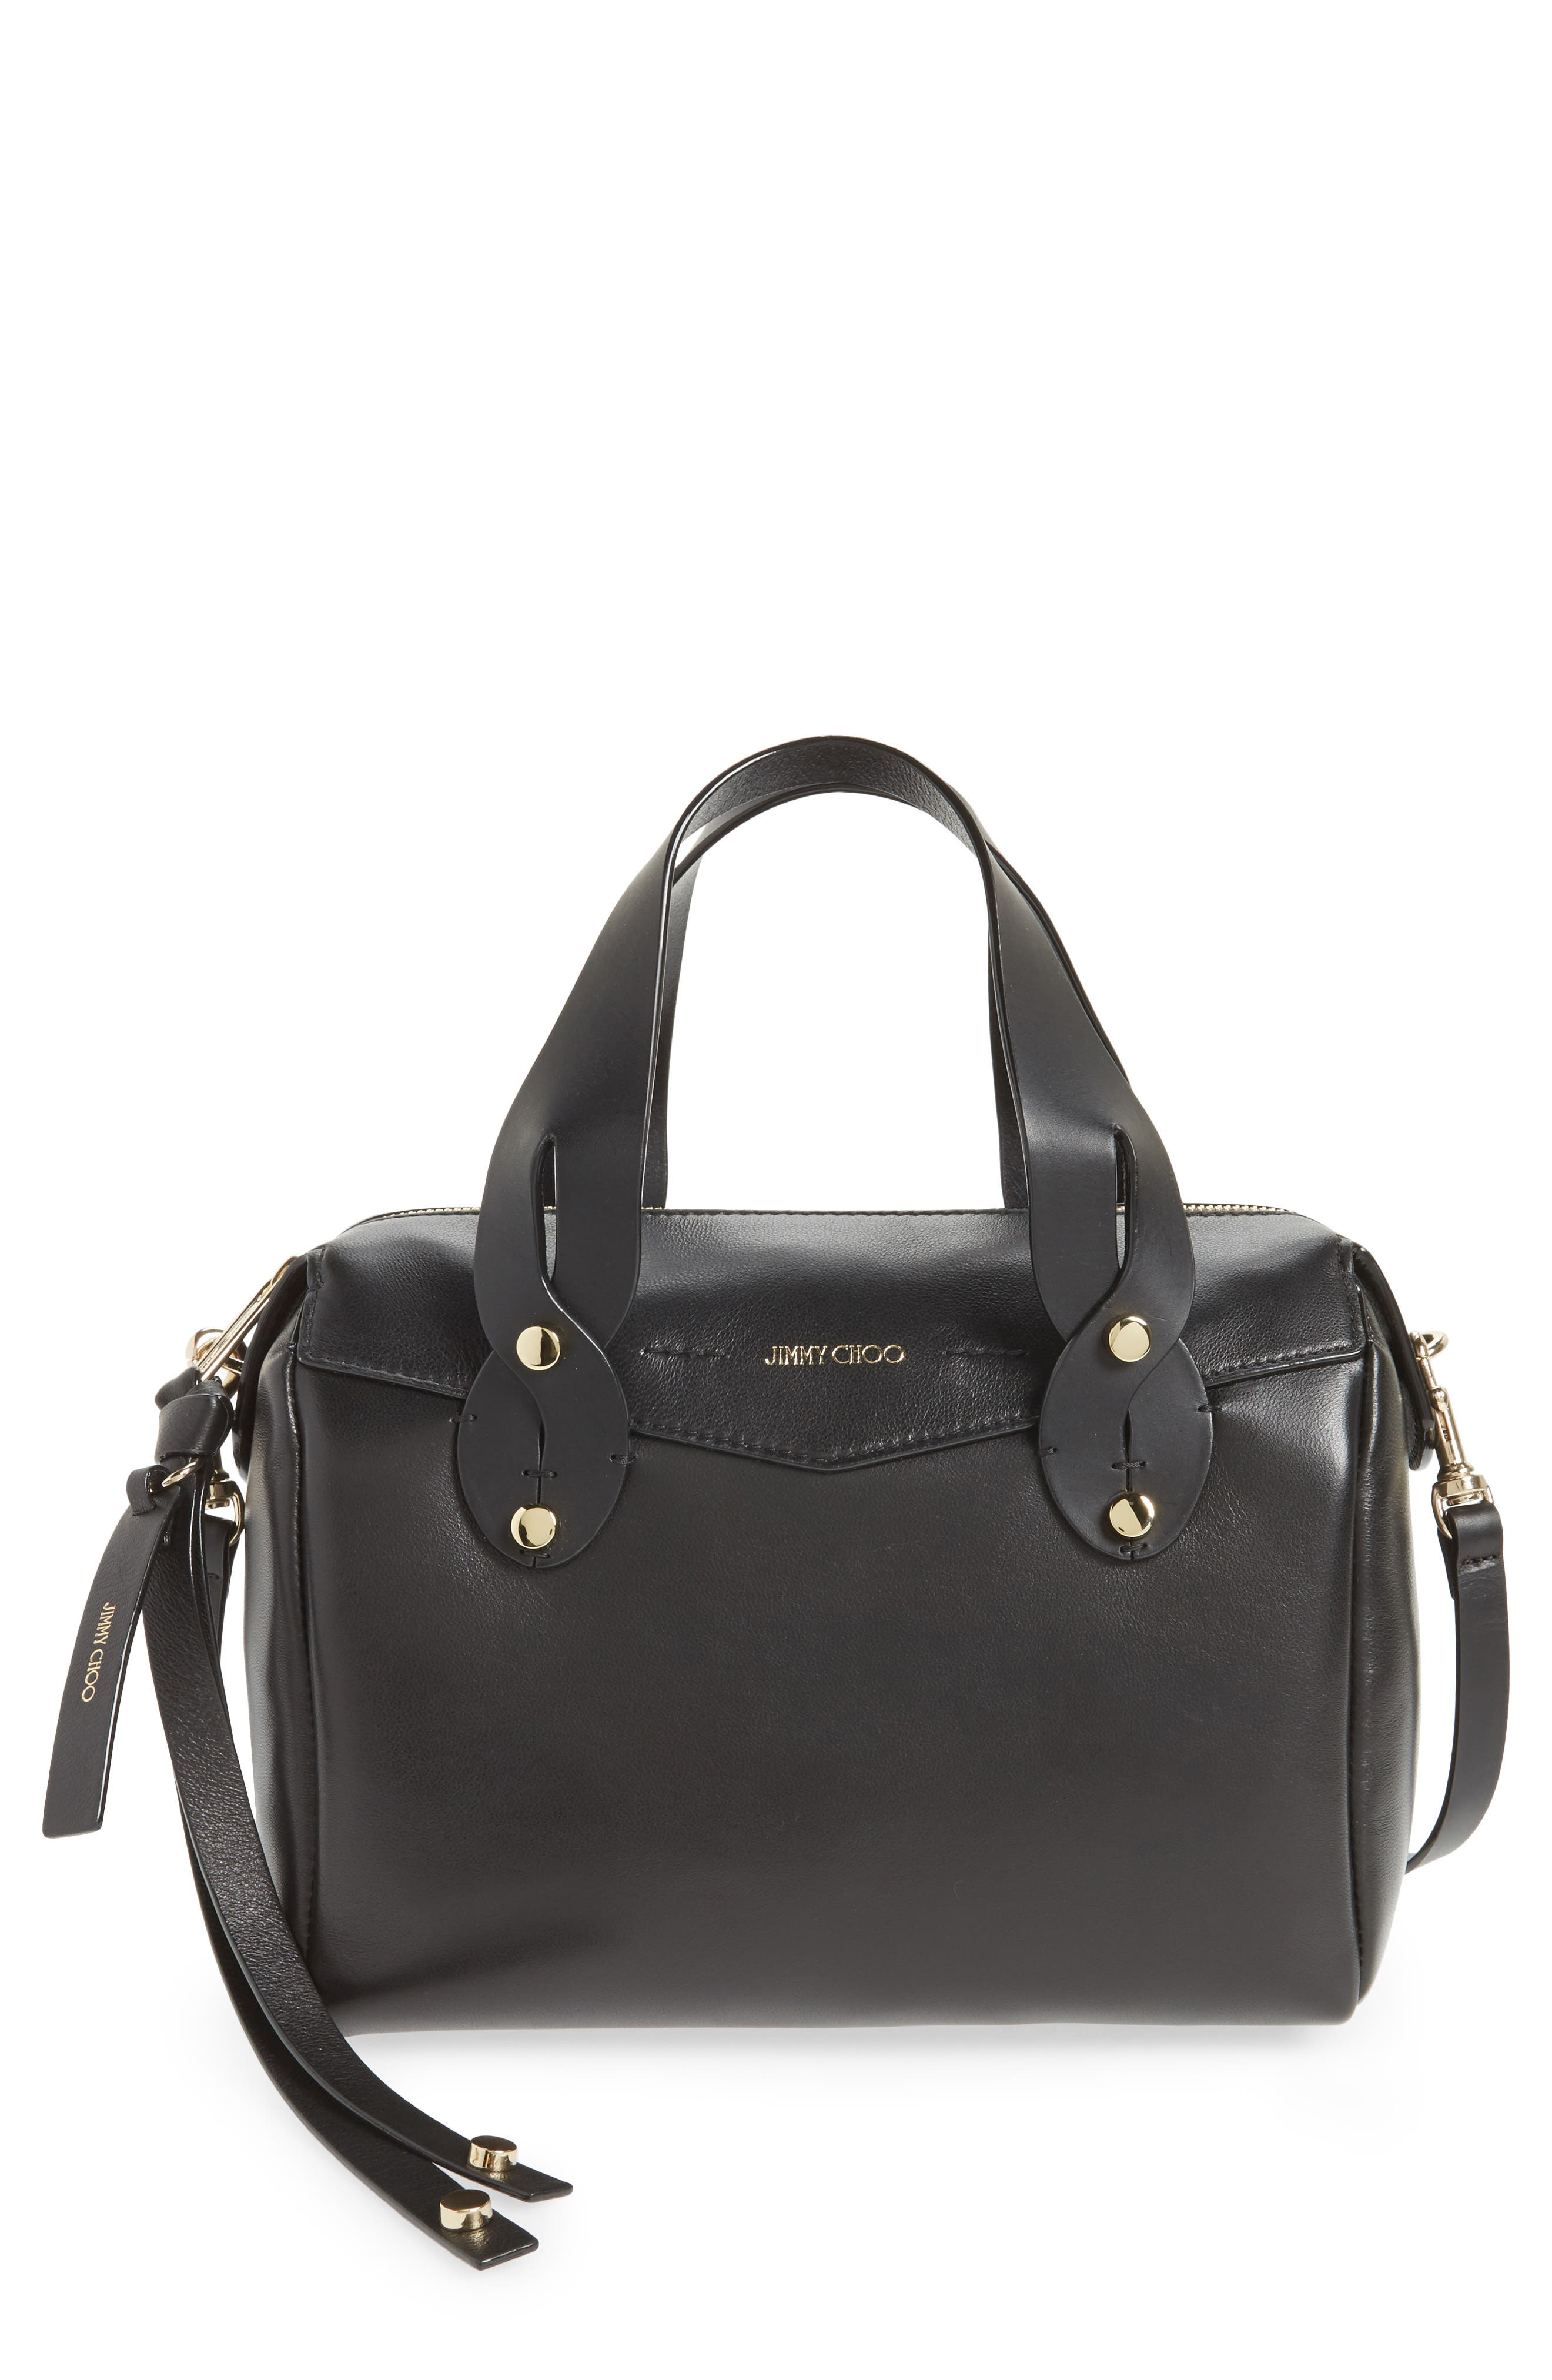 Jimmy Choo Small Allie Nappa Leather Bowling Bag